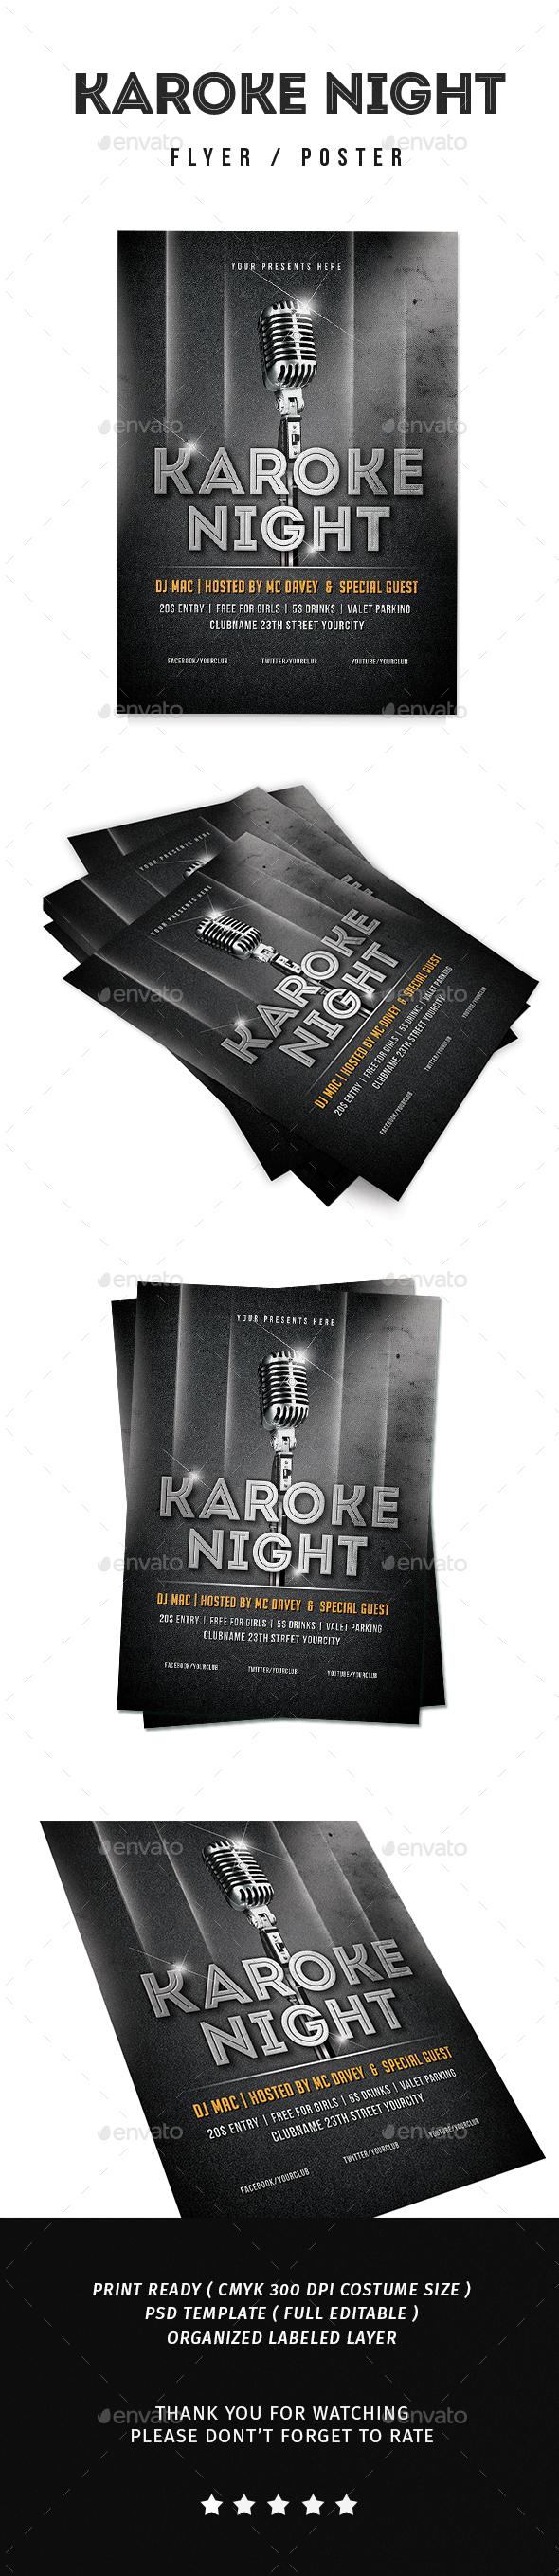 Karoke Night Flyer - Events Flyers